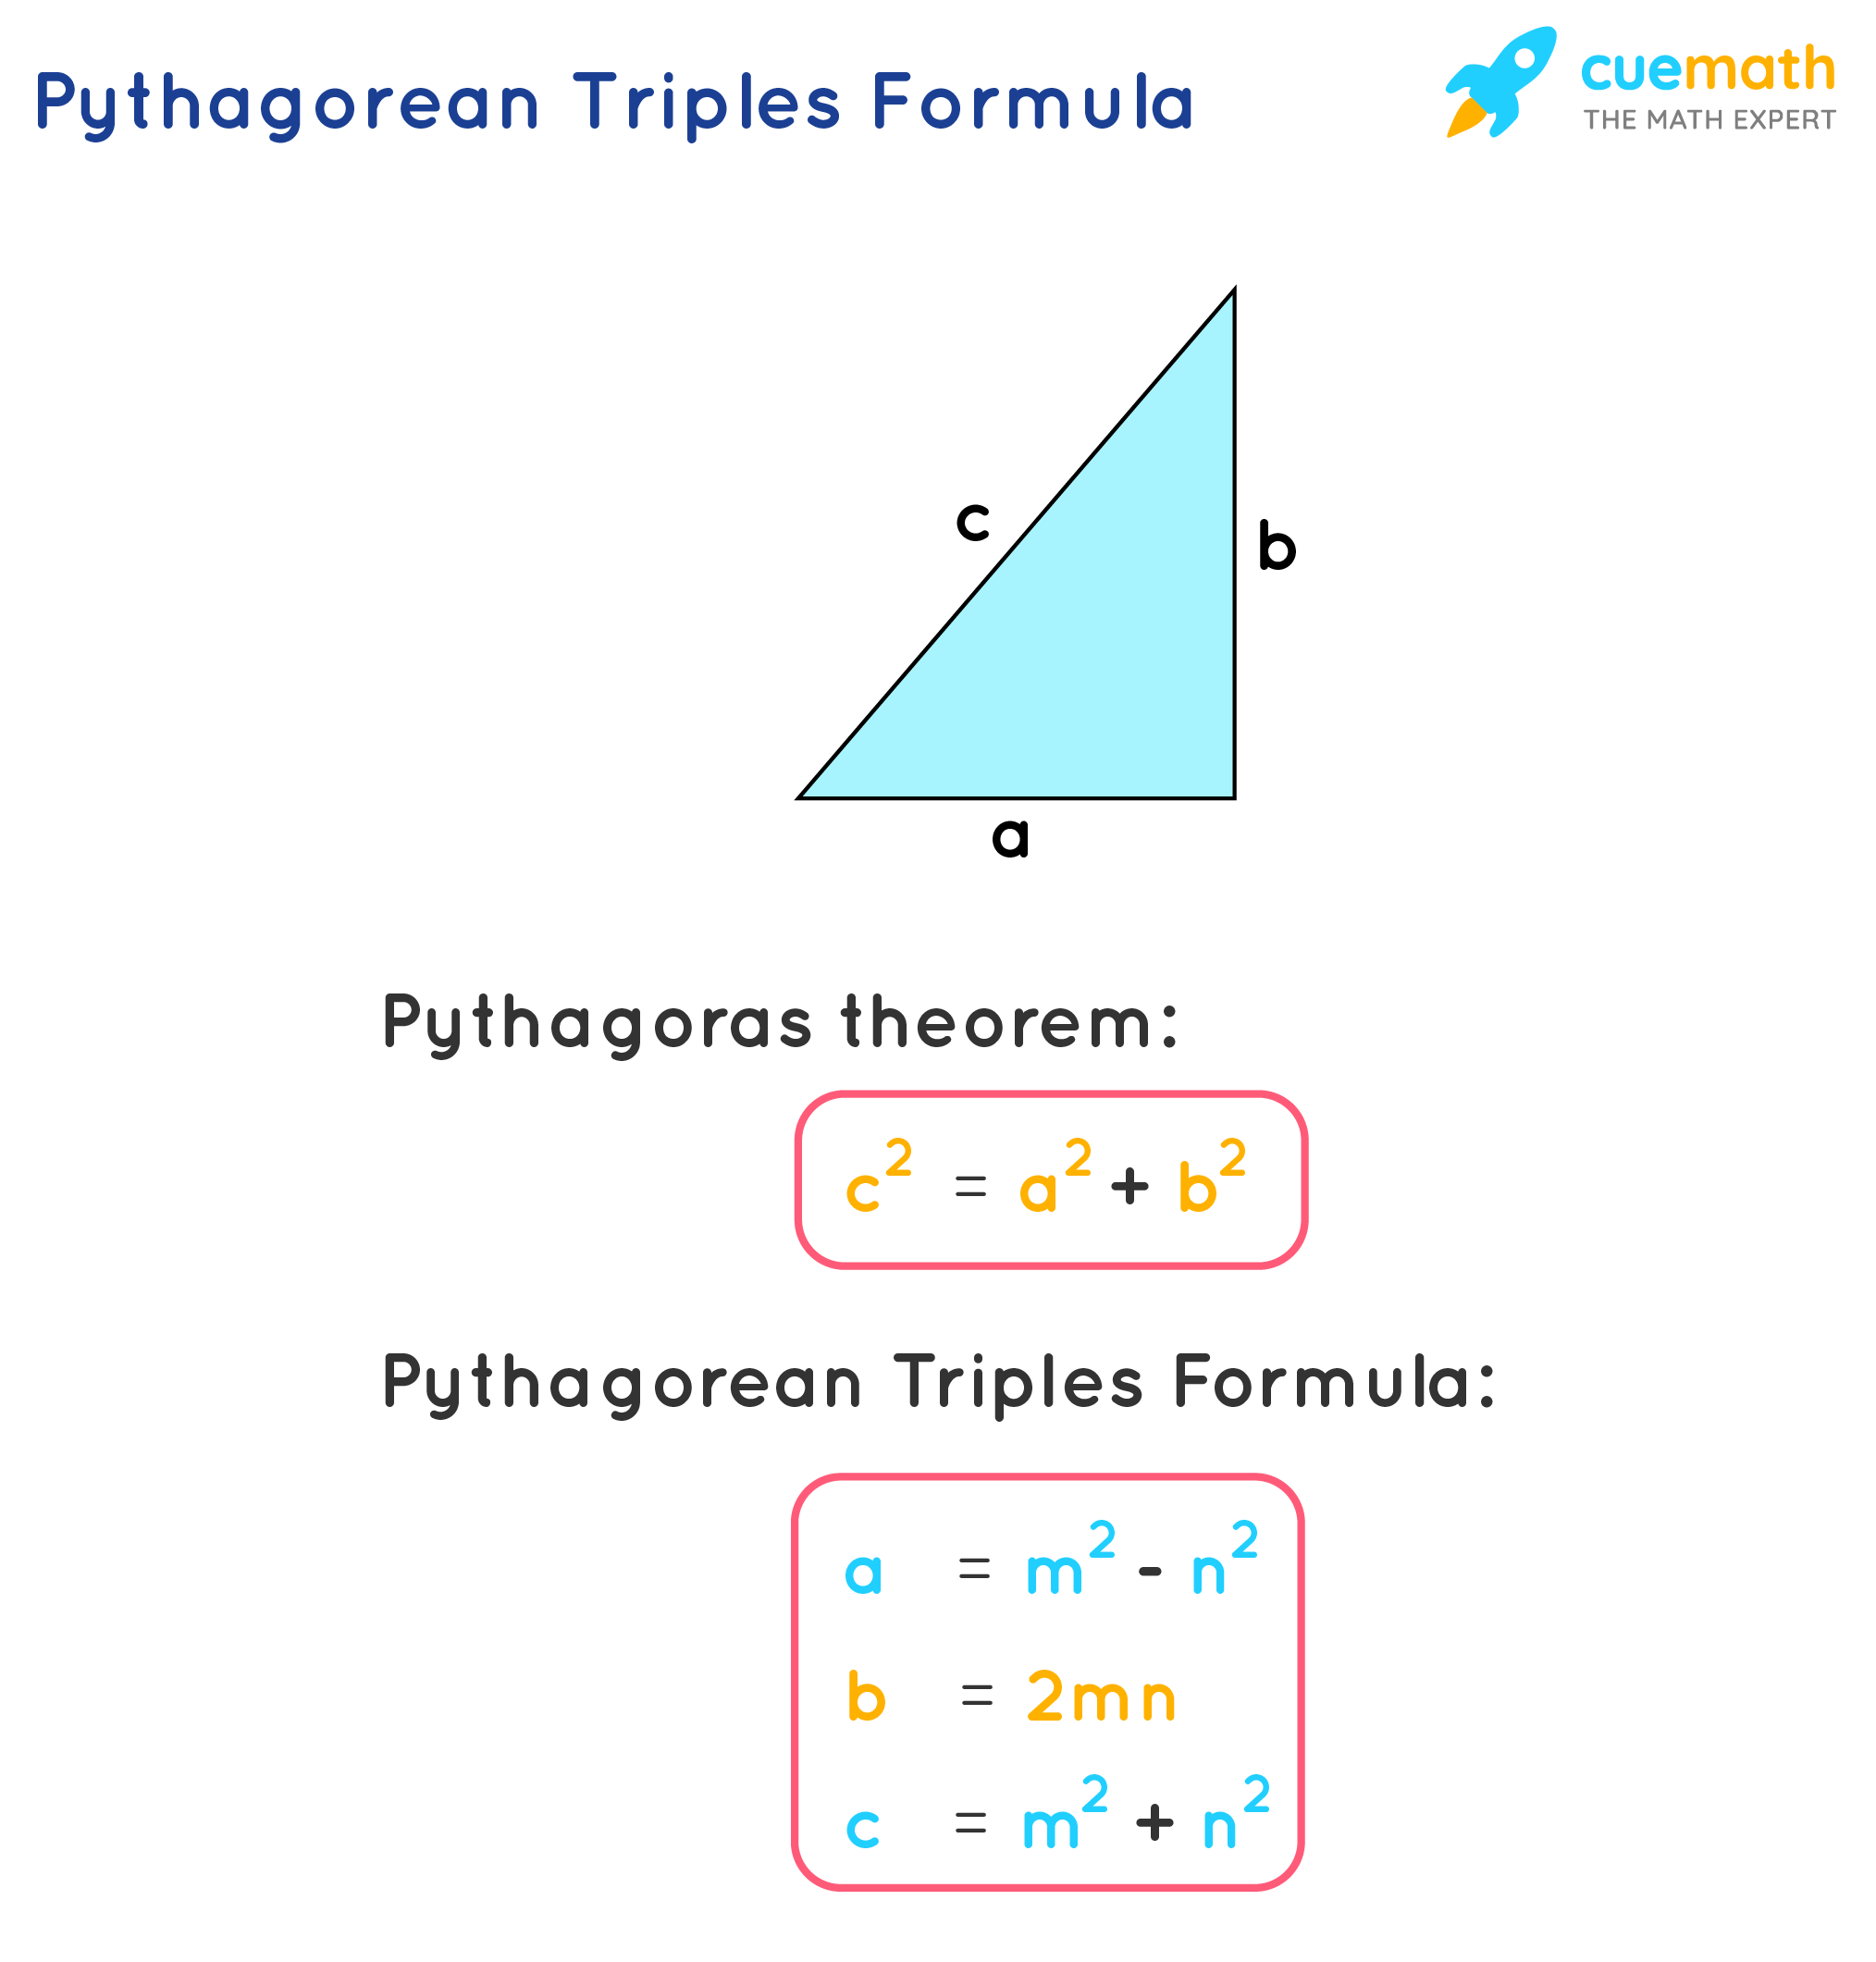 Pythagorean Triples Formula